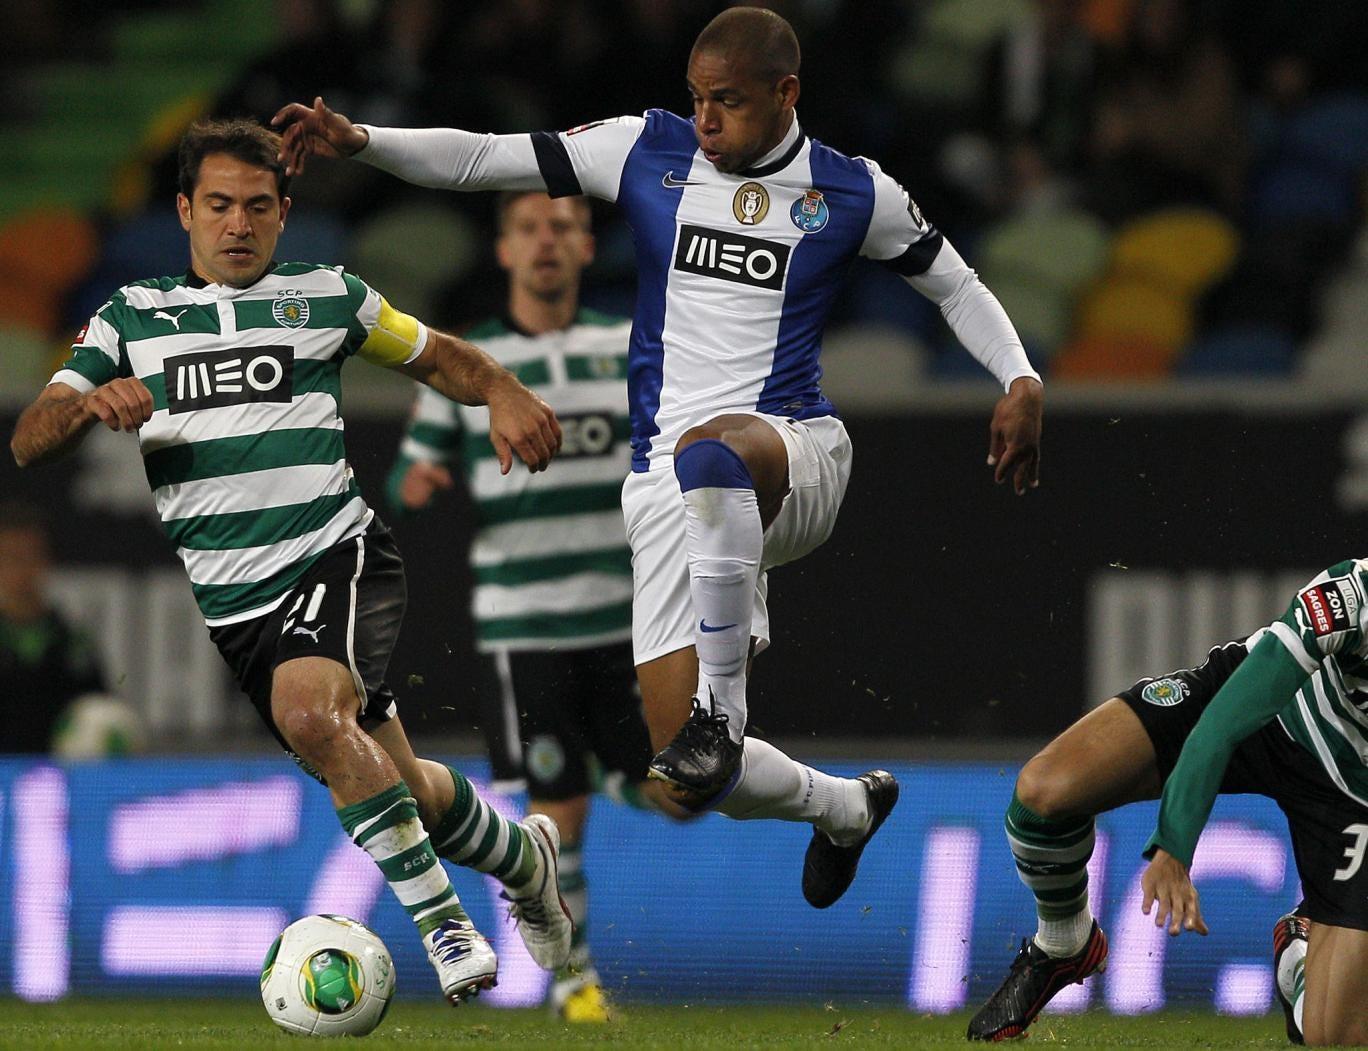 Everton-bound? Porto's Brazilian midfielder Fernando